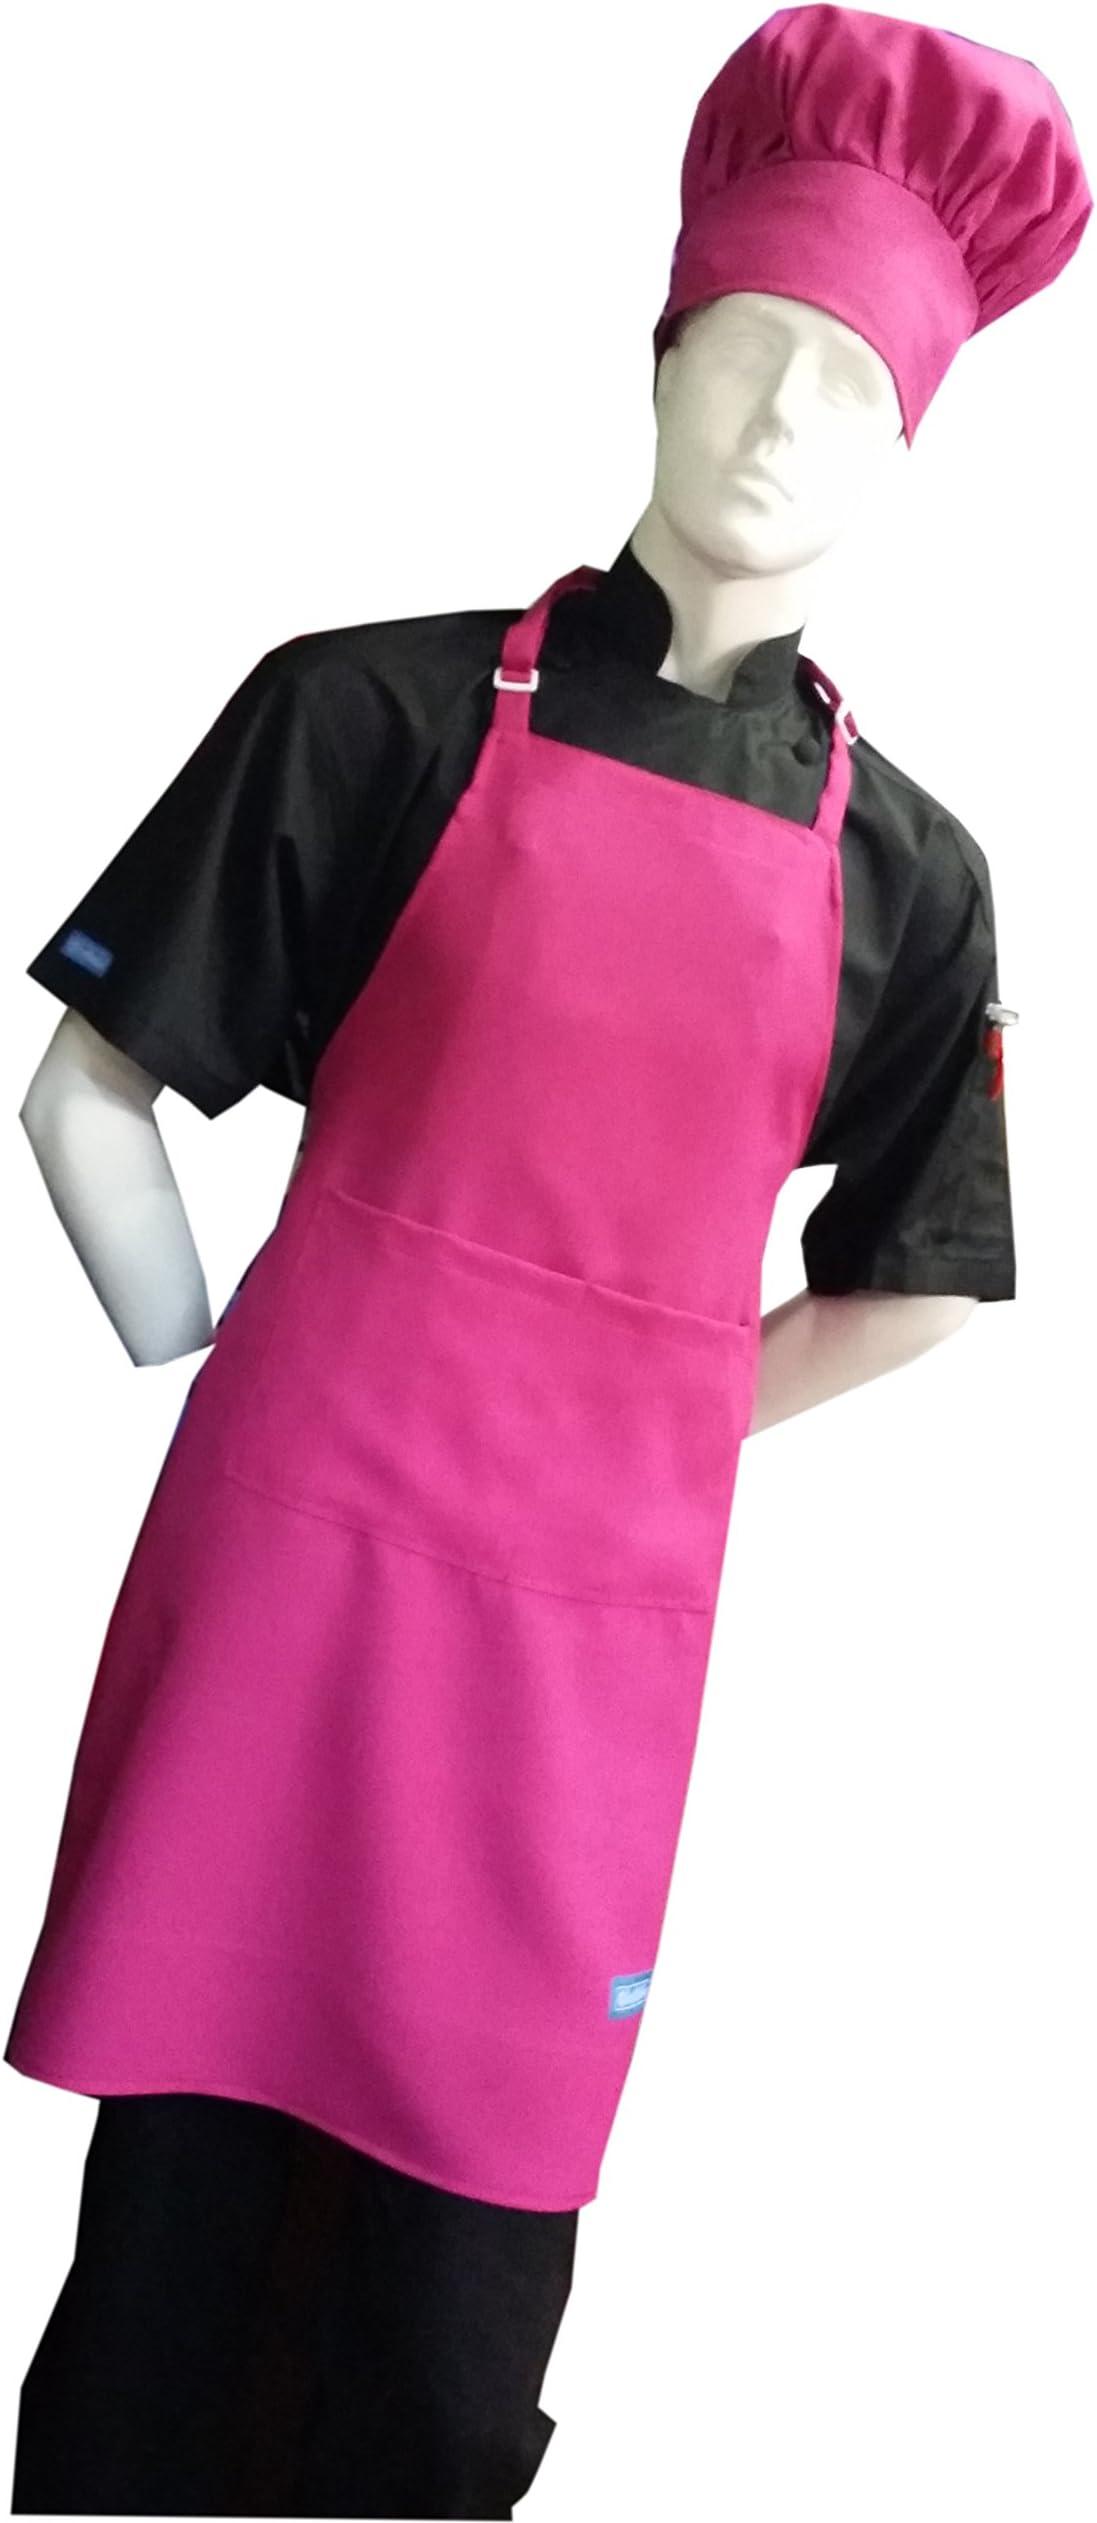 Pink fuchsia felt bottle apron